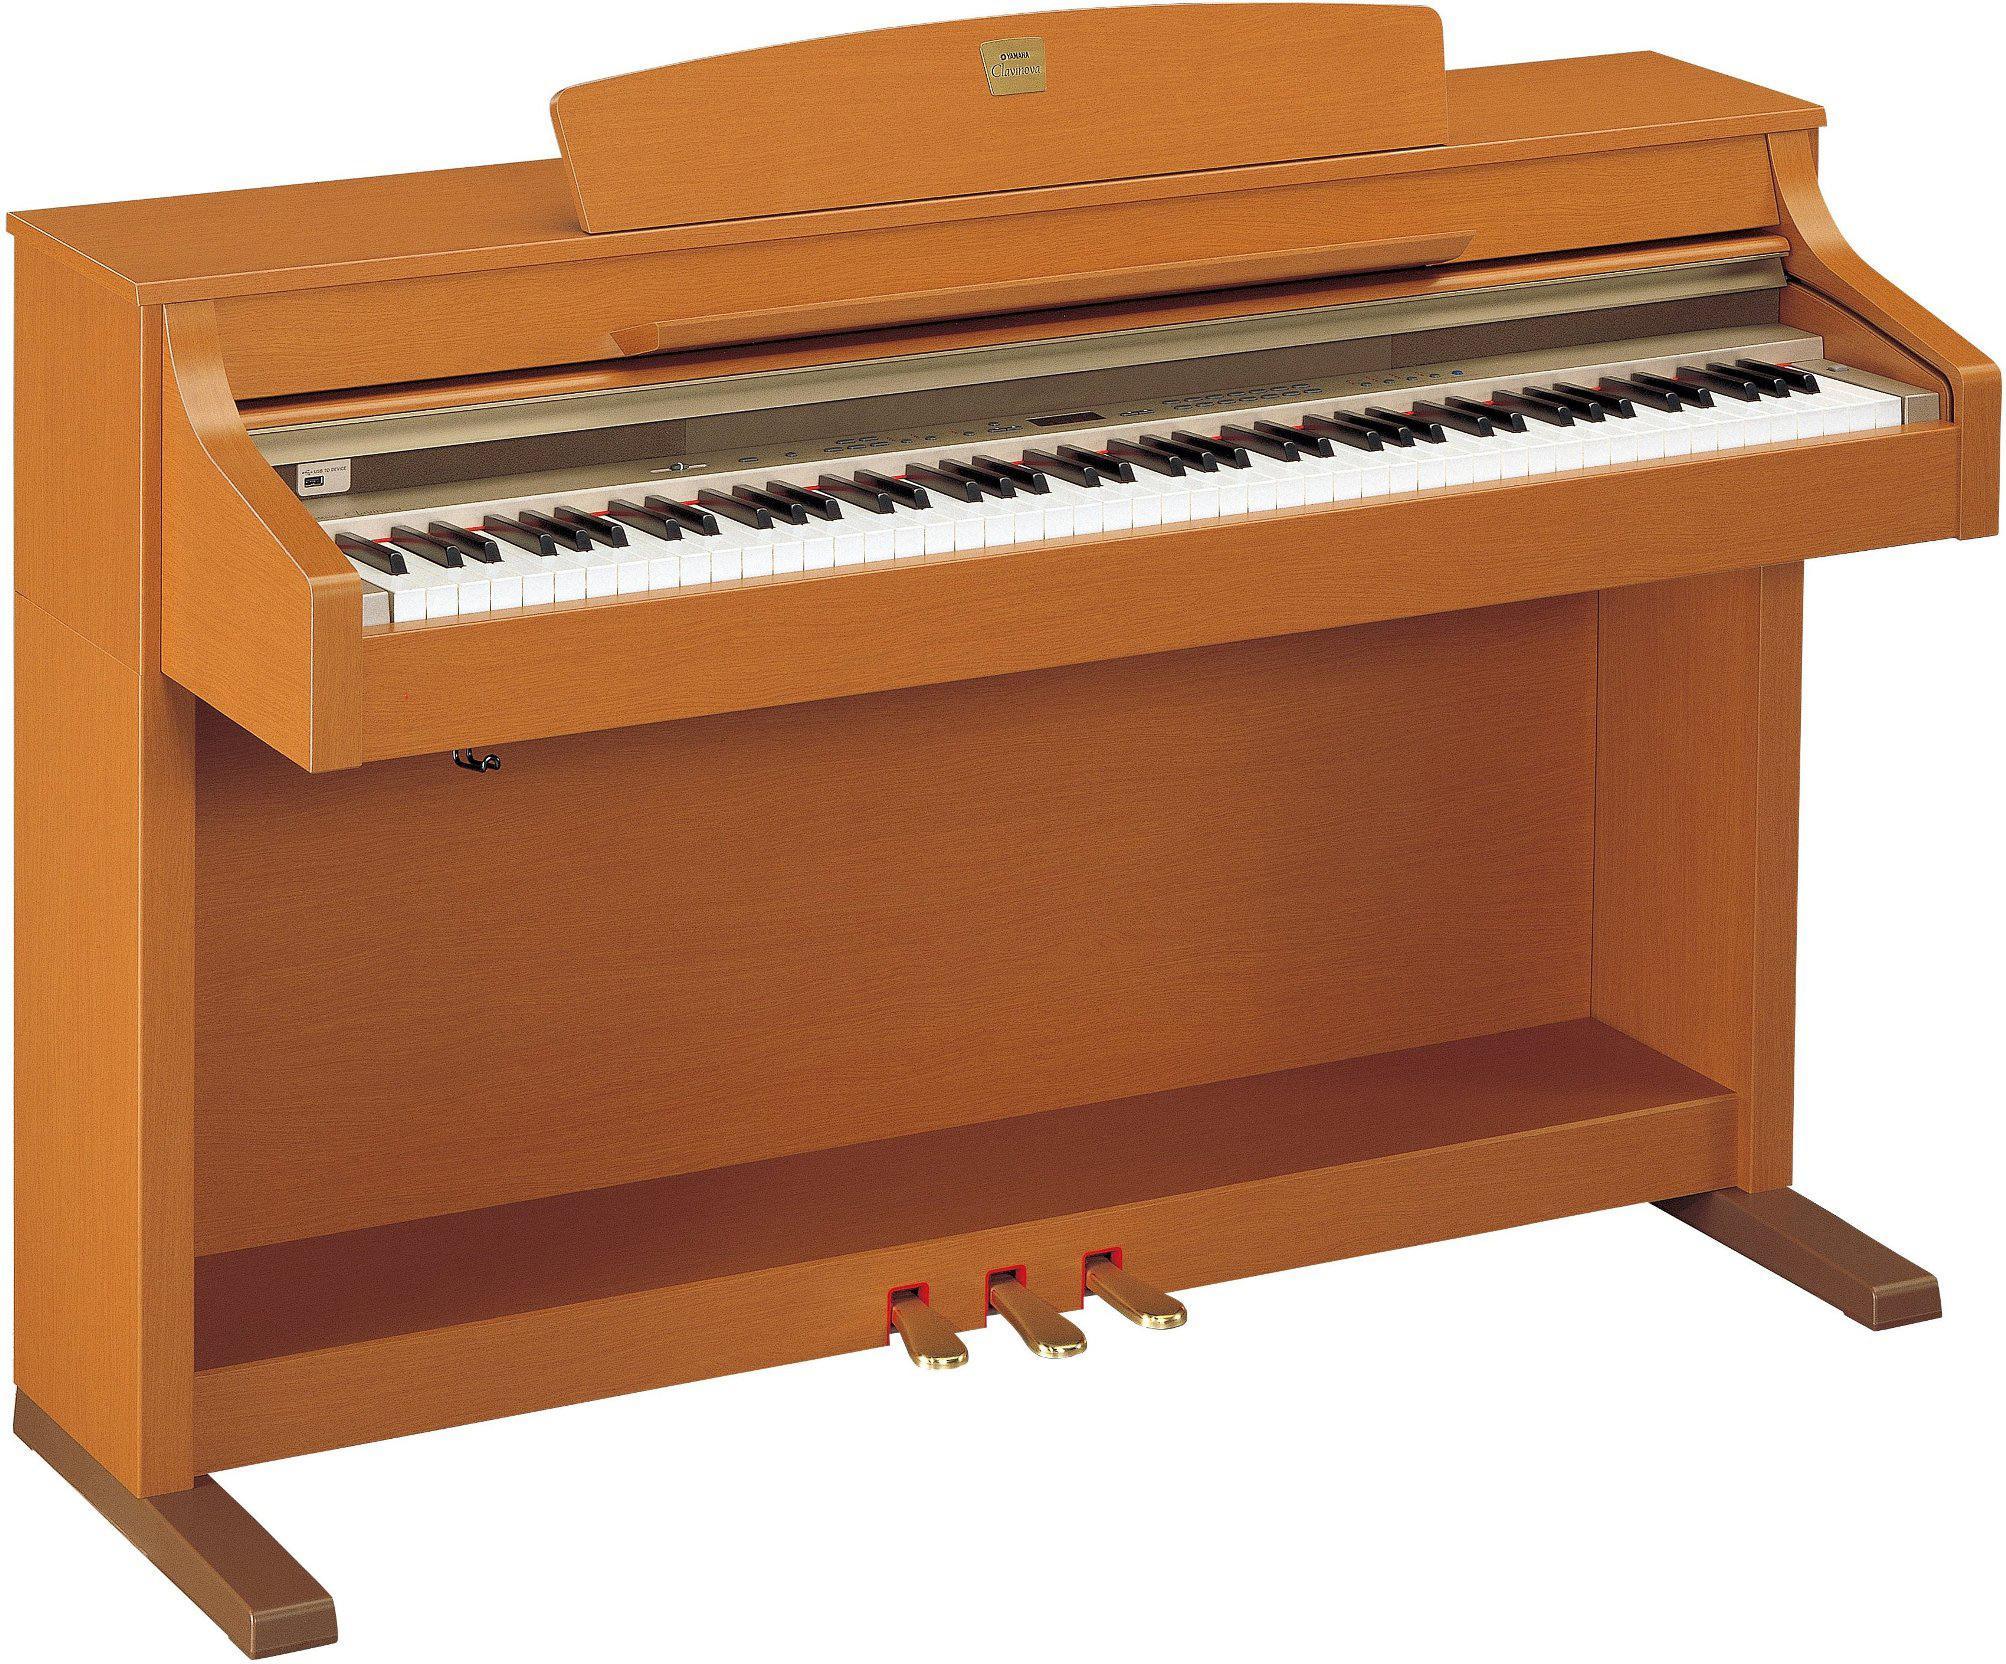 Цифровое пианино Yamaha CLP 330C (фортепиано цифровое)